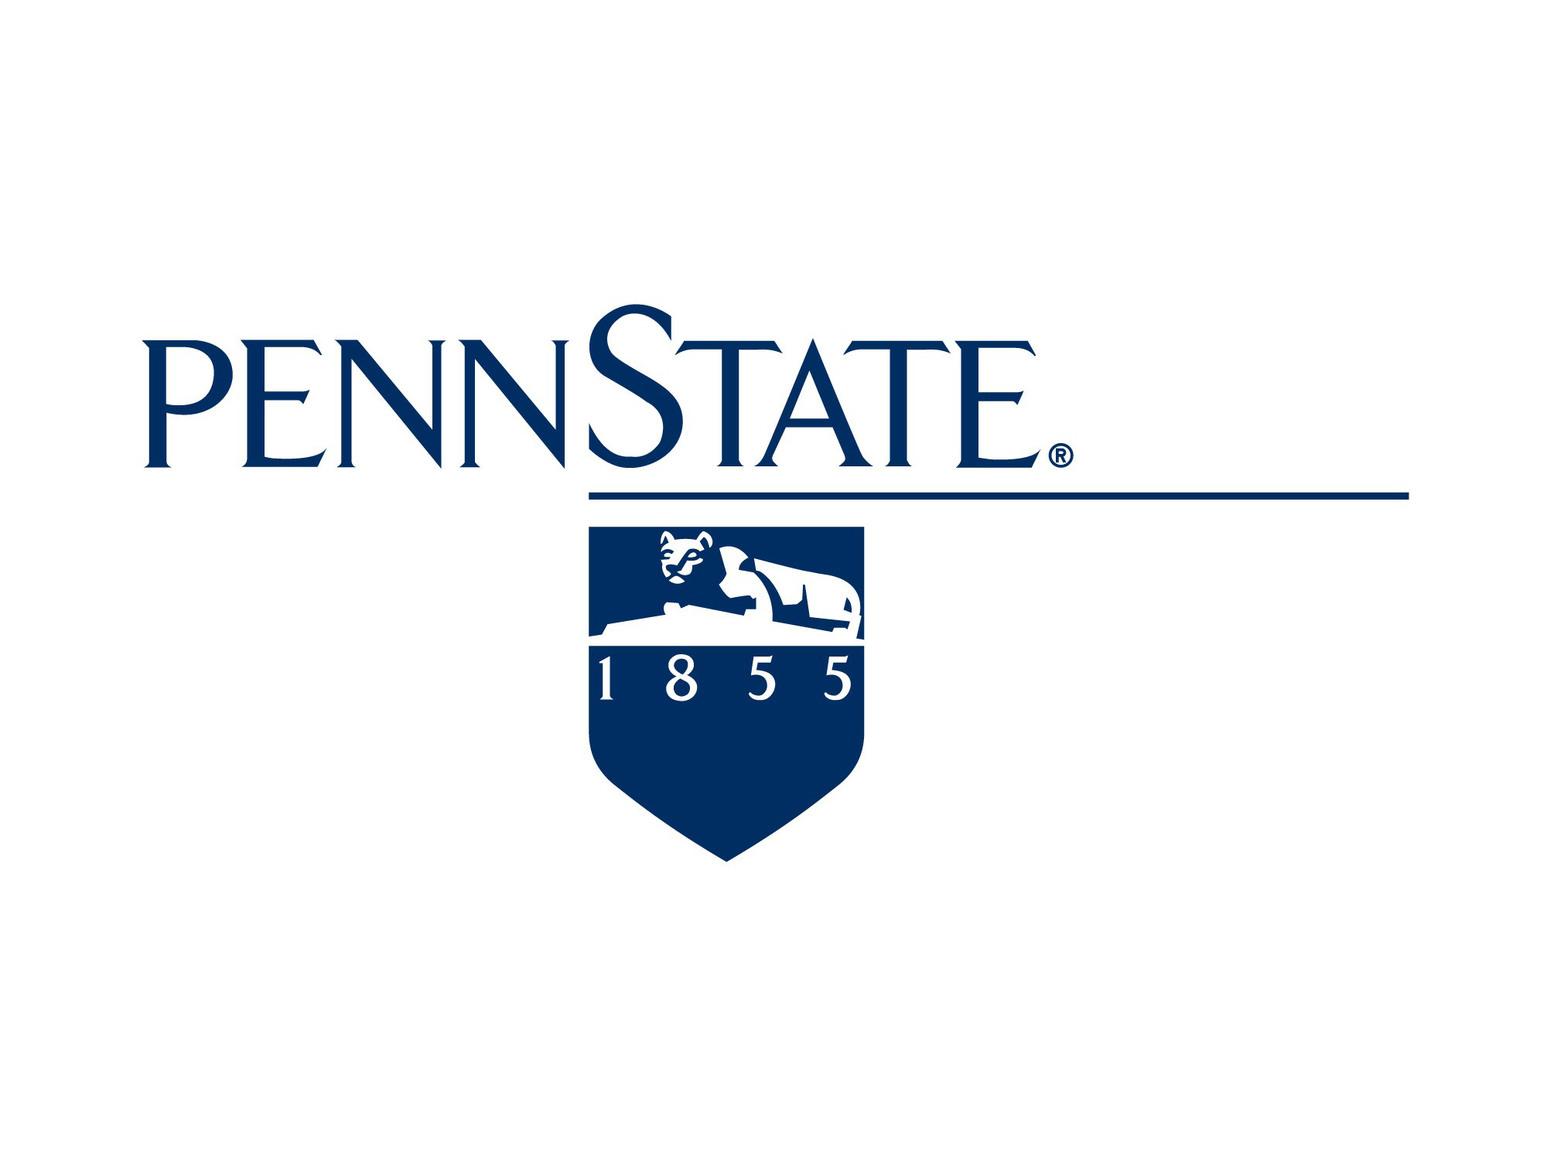 Penn state logo clipart banner freeuse stock Power Ranking The Five Penn State Logos - Onward State banner freeuse stock